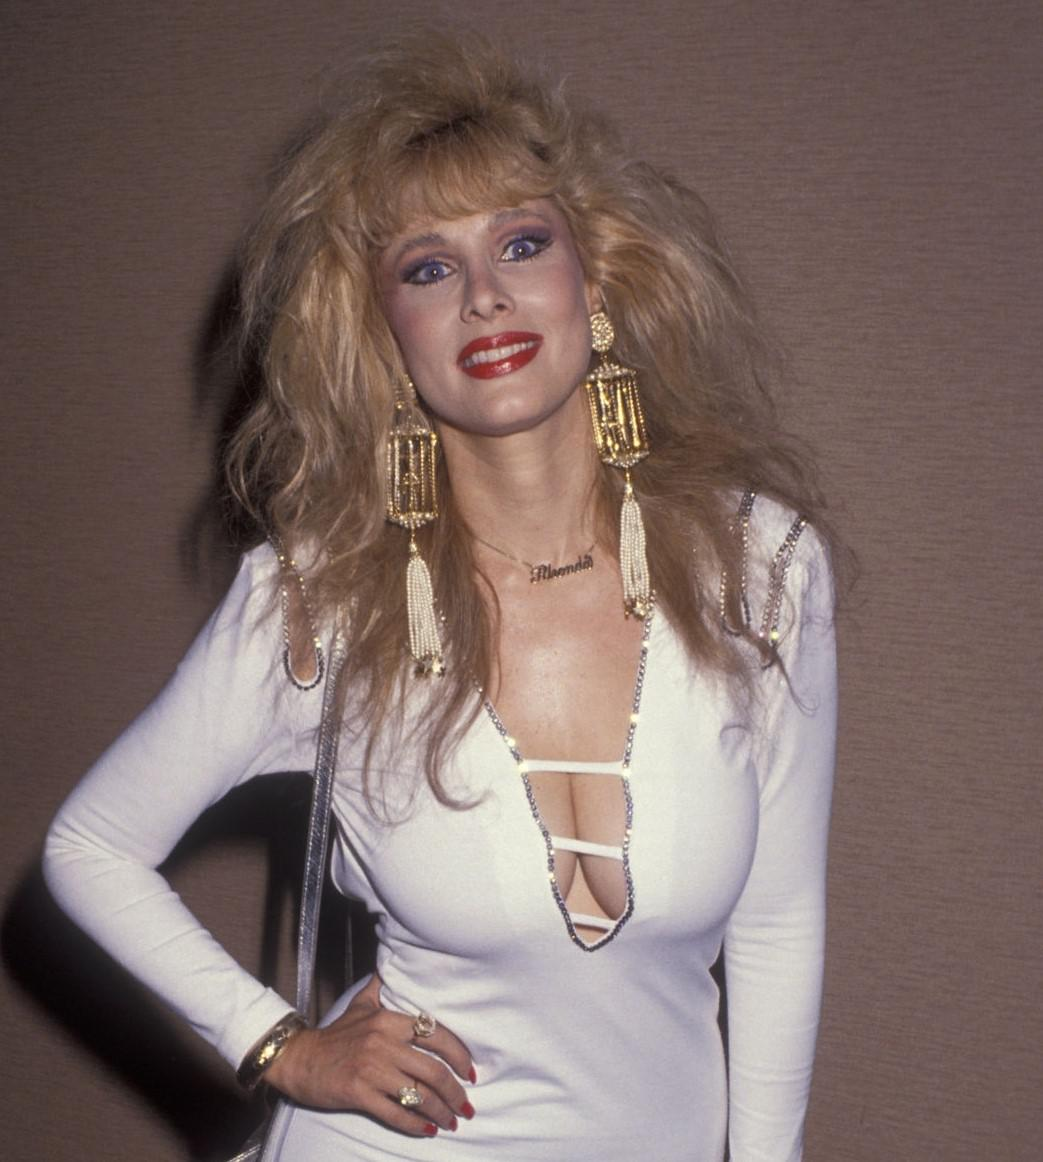 She is known for her role as a host. Rhonda Shear 1990's : OldSchoolCelebs